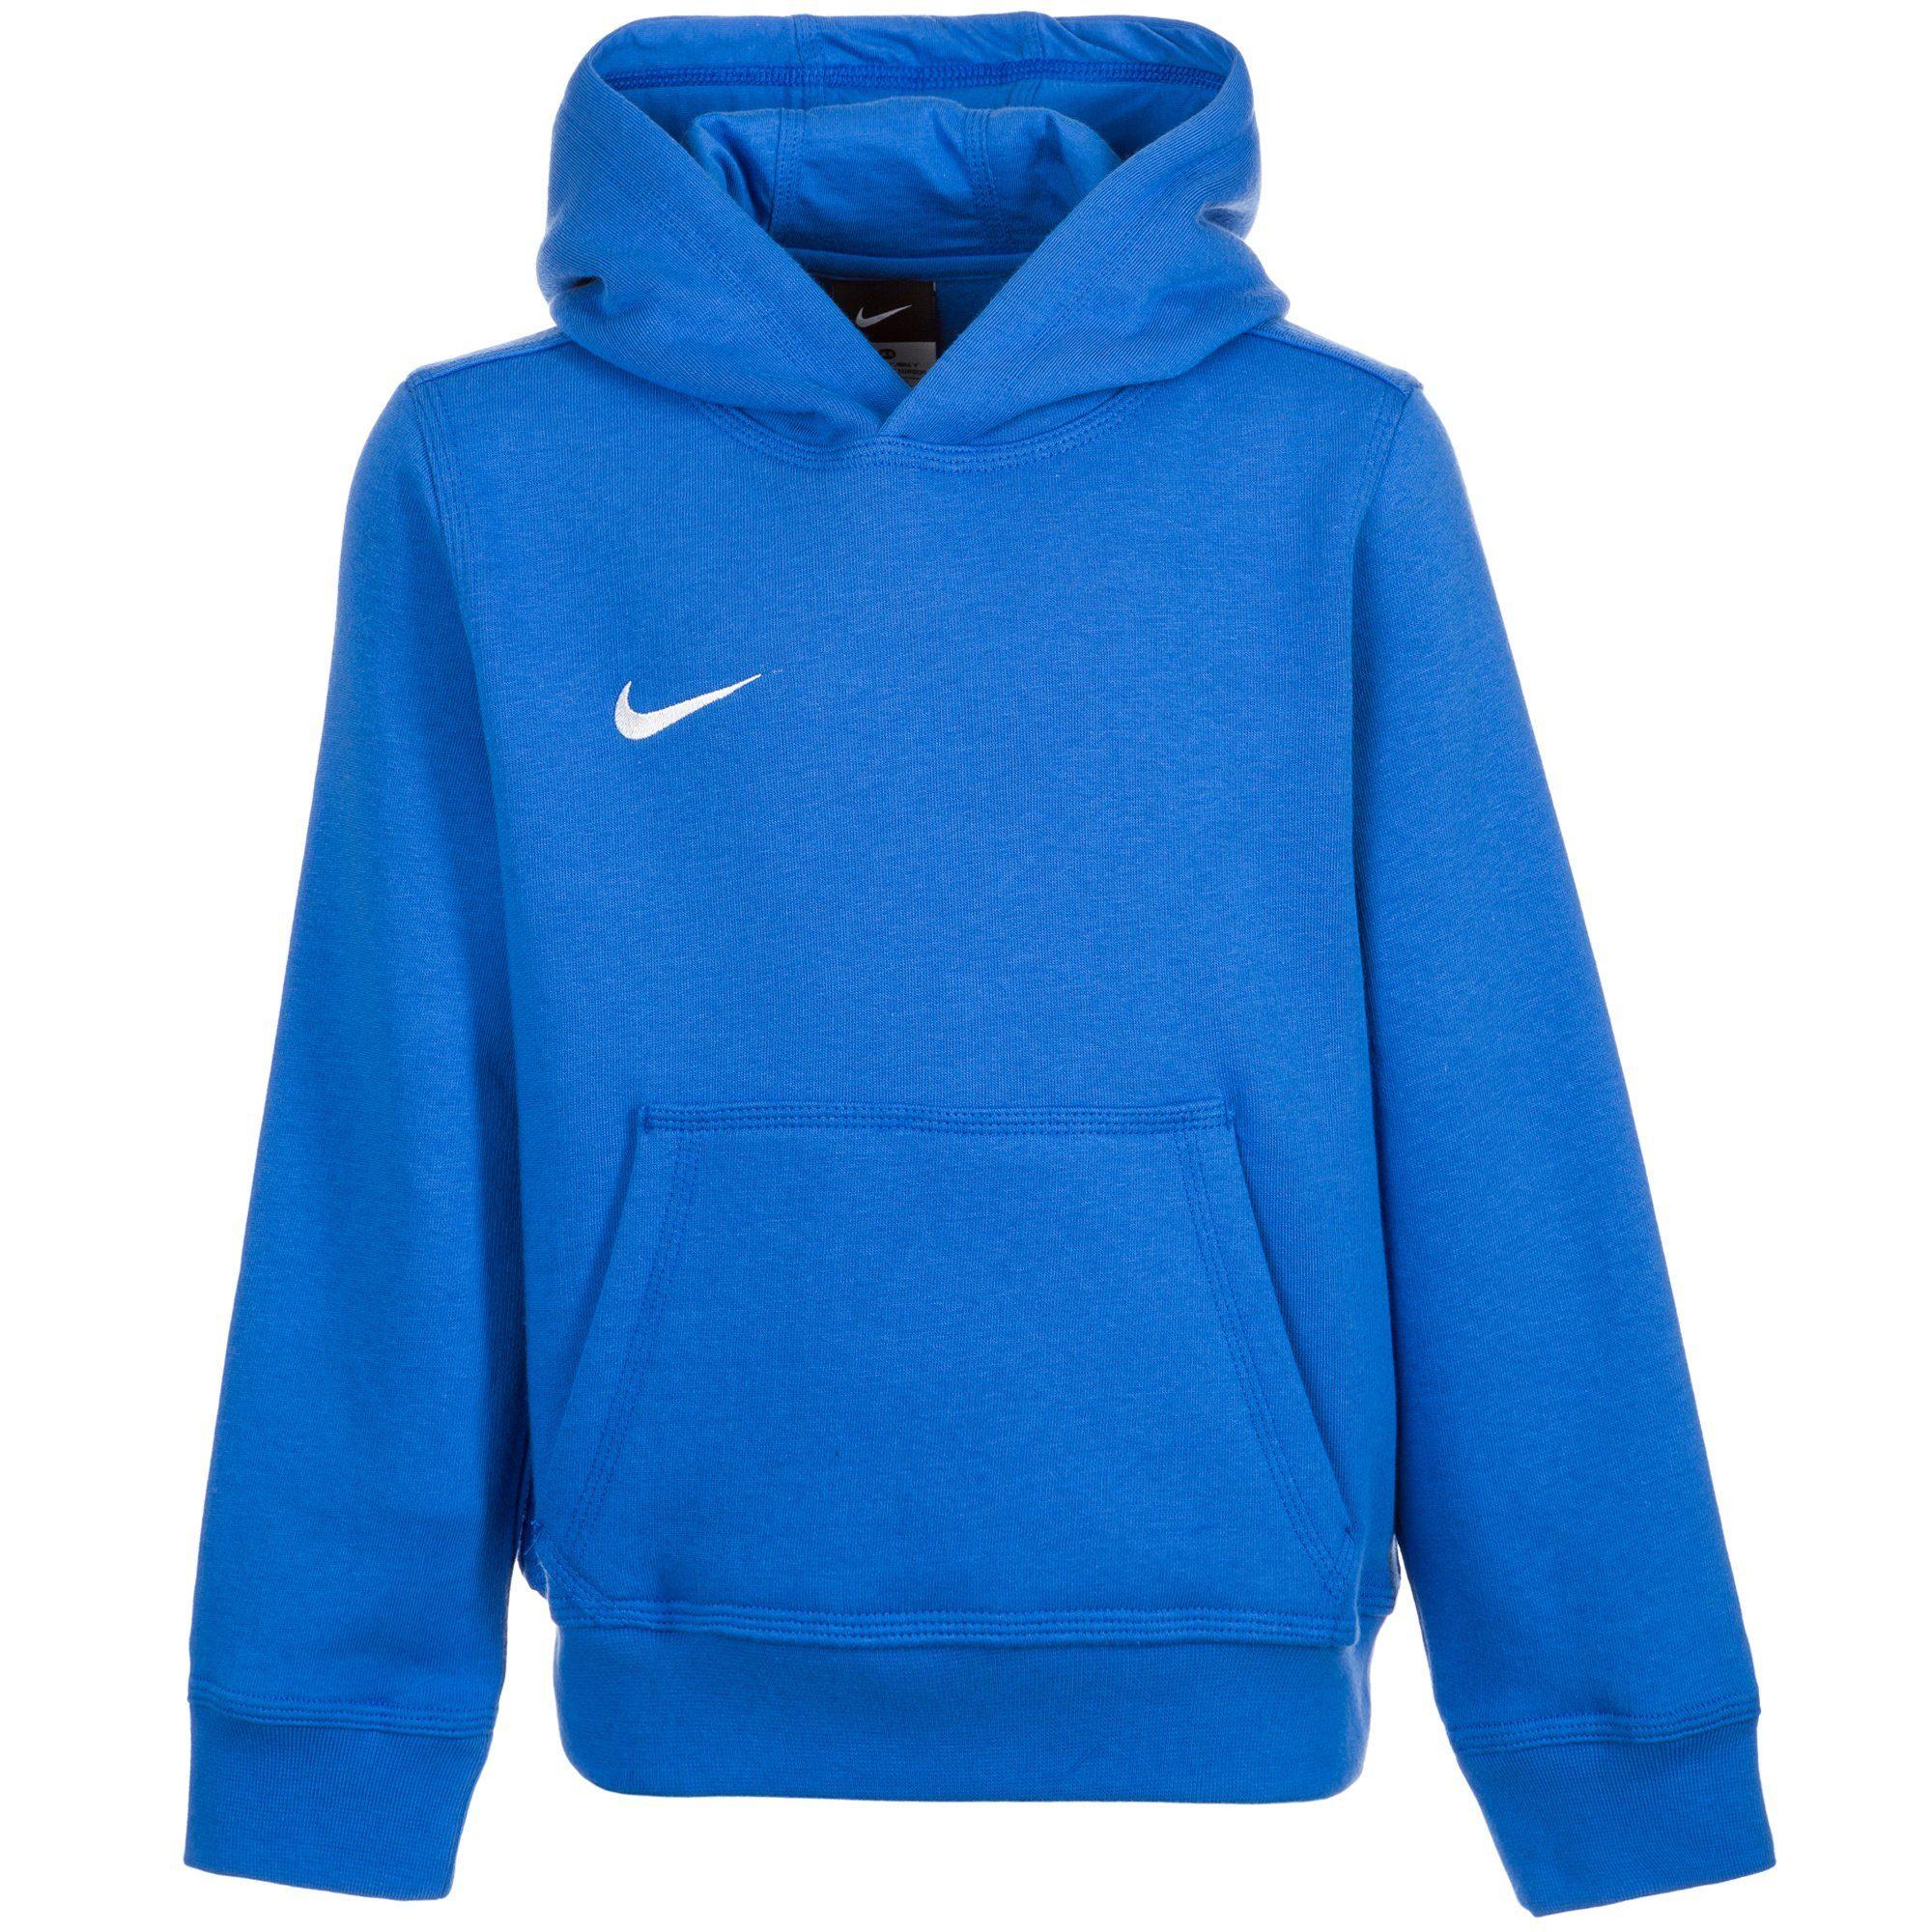 detailed look feb01 dbe15 Nike Kapuzenpullover »Team Club« kaufen   BAUR